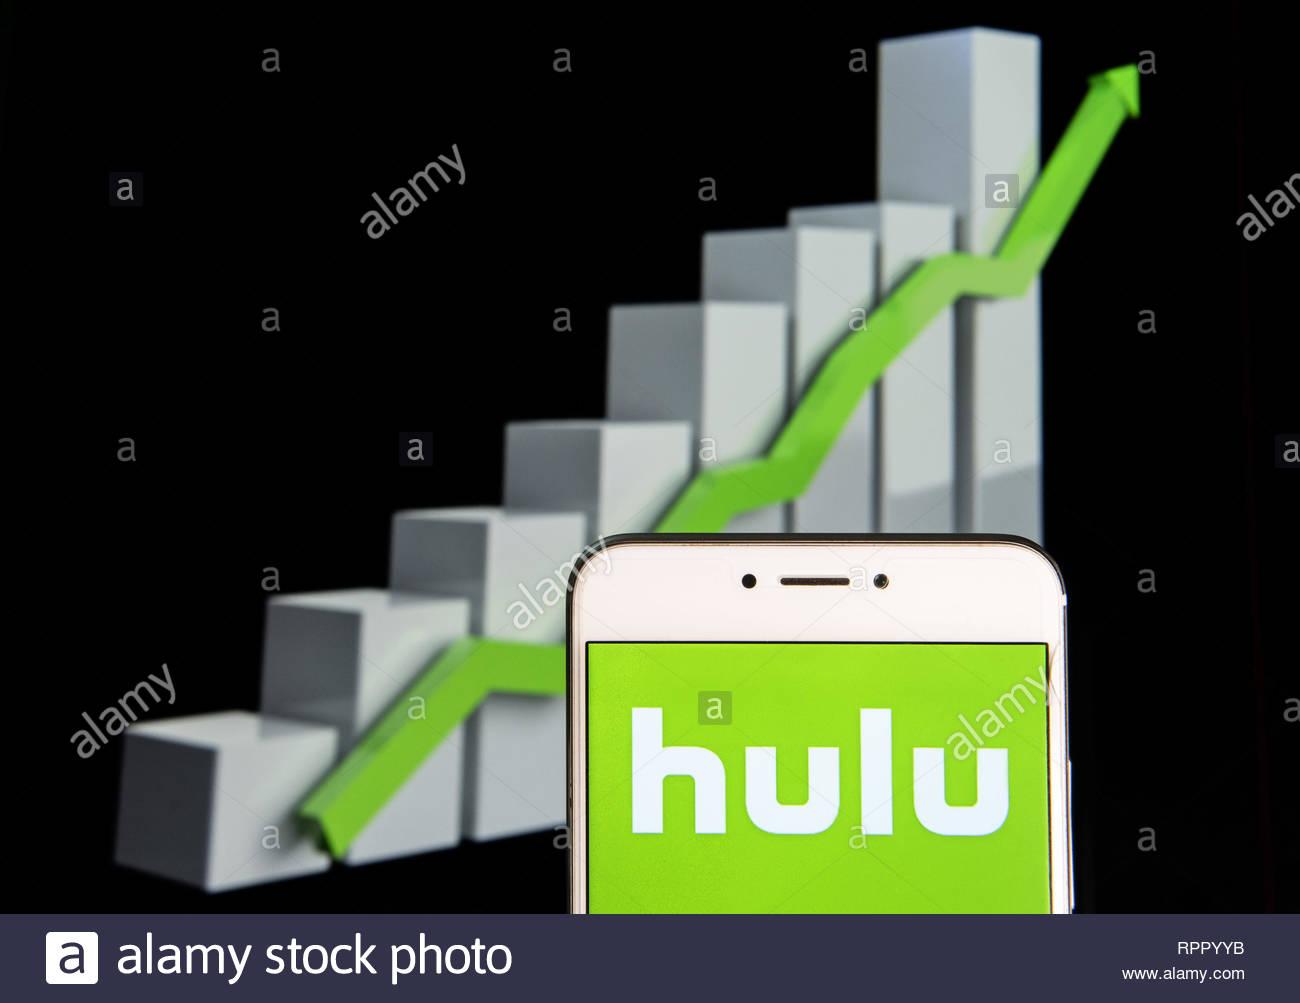 Hulu App Stock Photos Hulu App Stock Images   Alamy 1300x1003